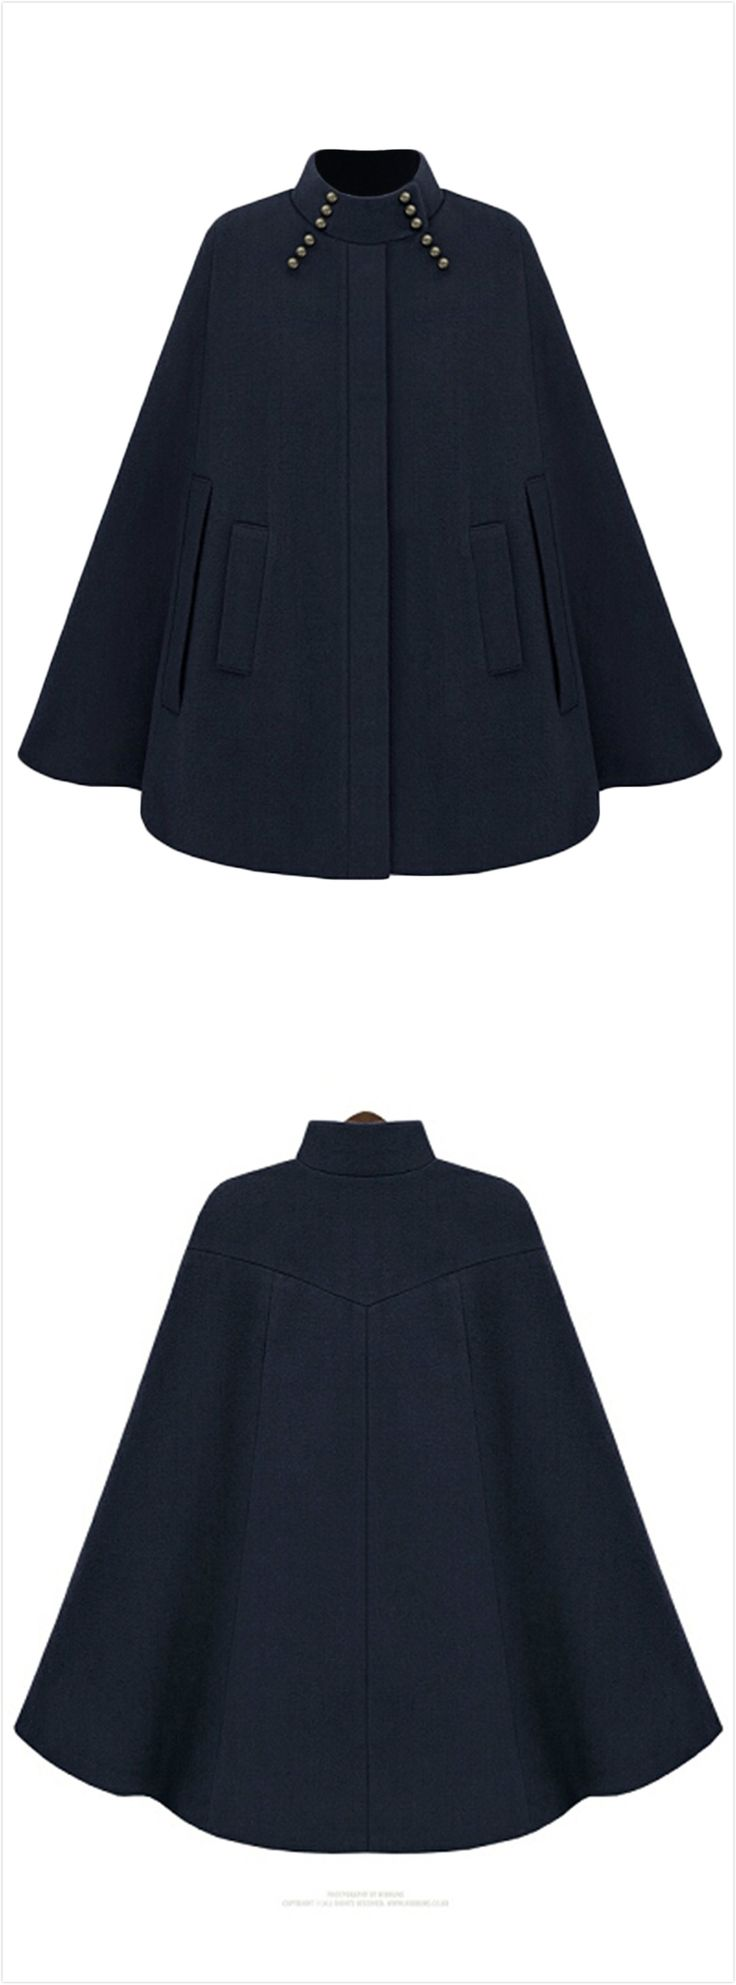 Women's Fashion Winter Warm Woolen Cape Cloak Coat